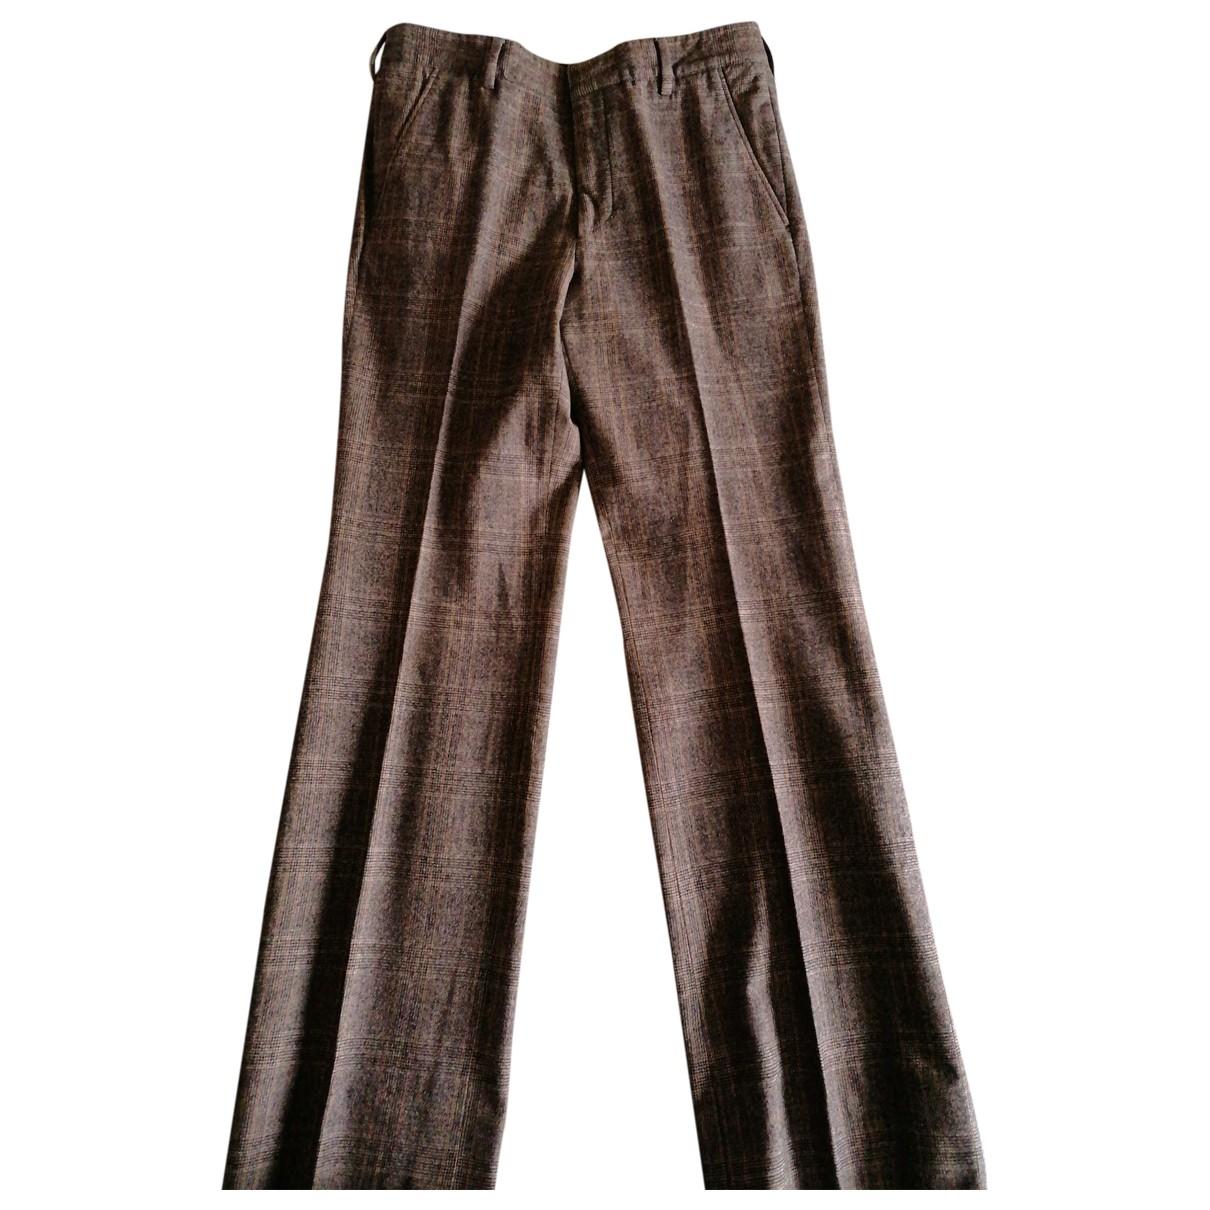 Fendi \N Brown Cashmere Trousers for Men M International